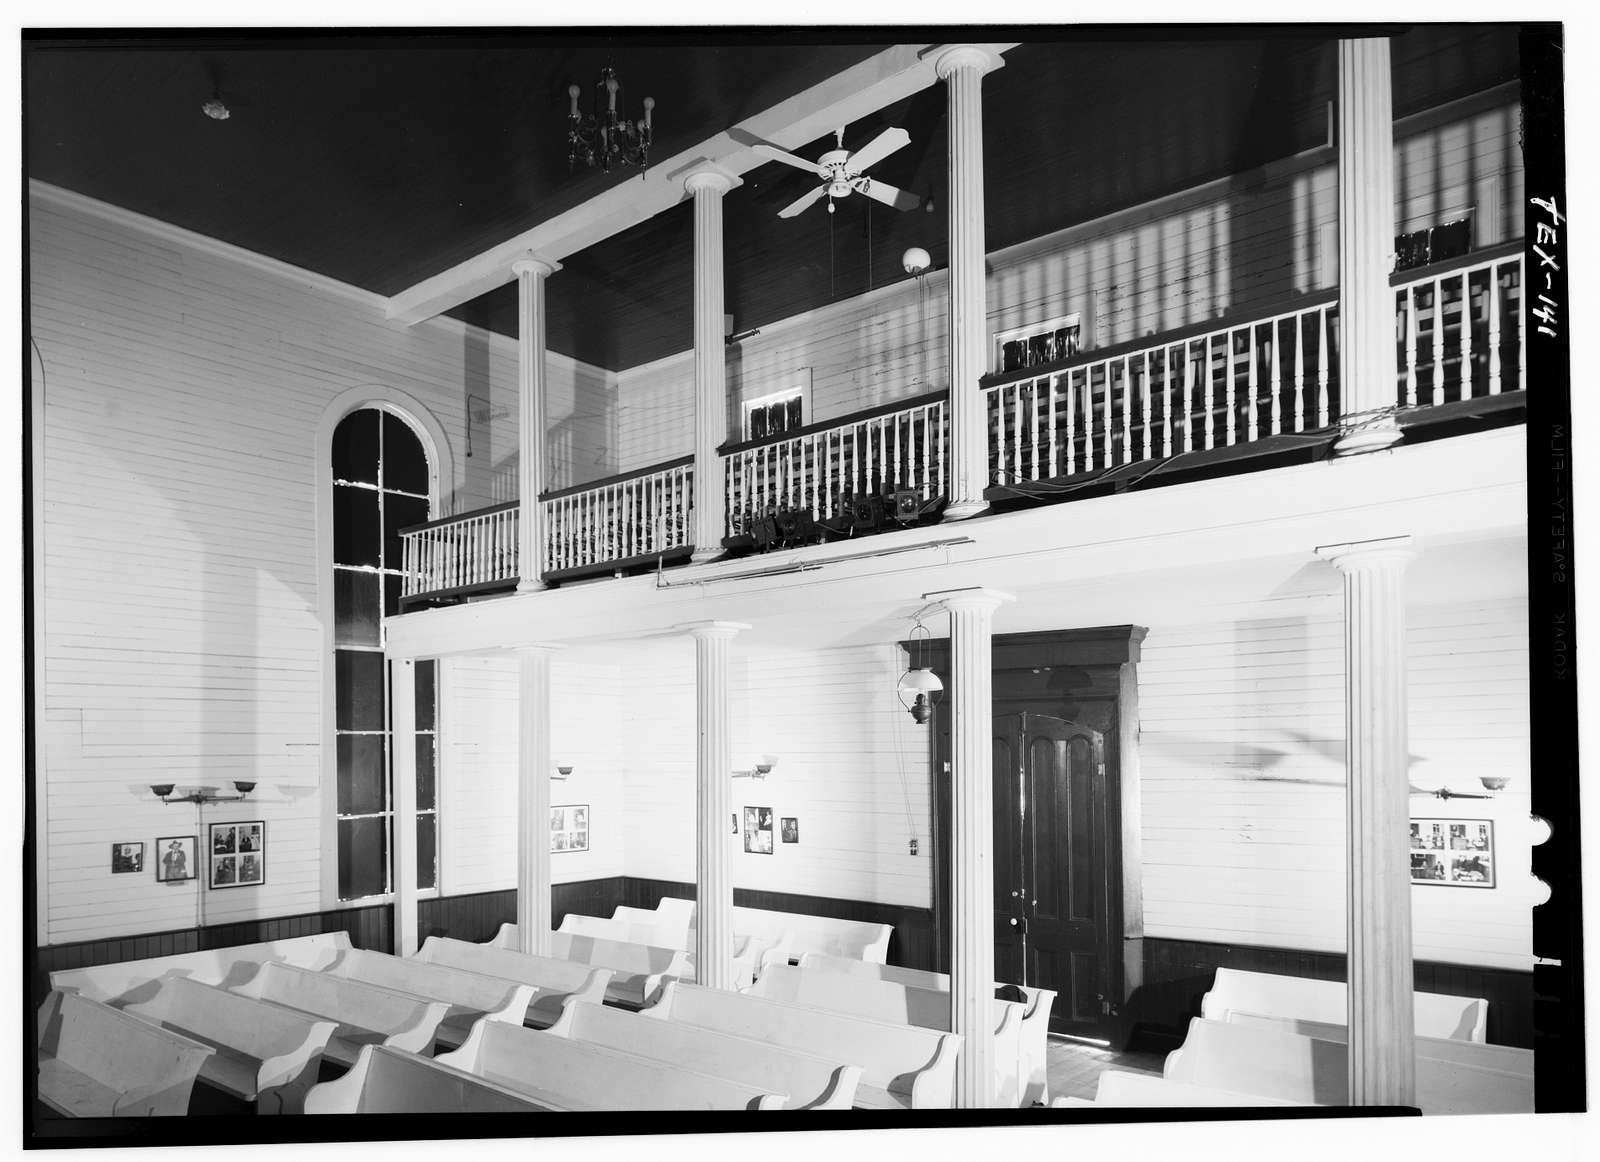 St. Mary's Catholic School-Sinai Hebrew Synagogue, 209 North Henderson Street, Jefferson, Marion County, TX